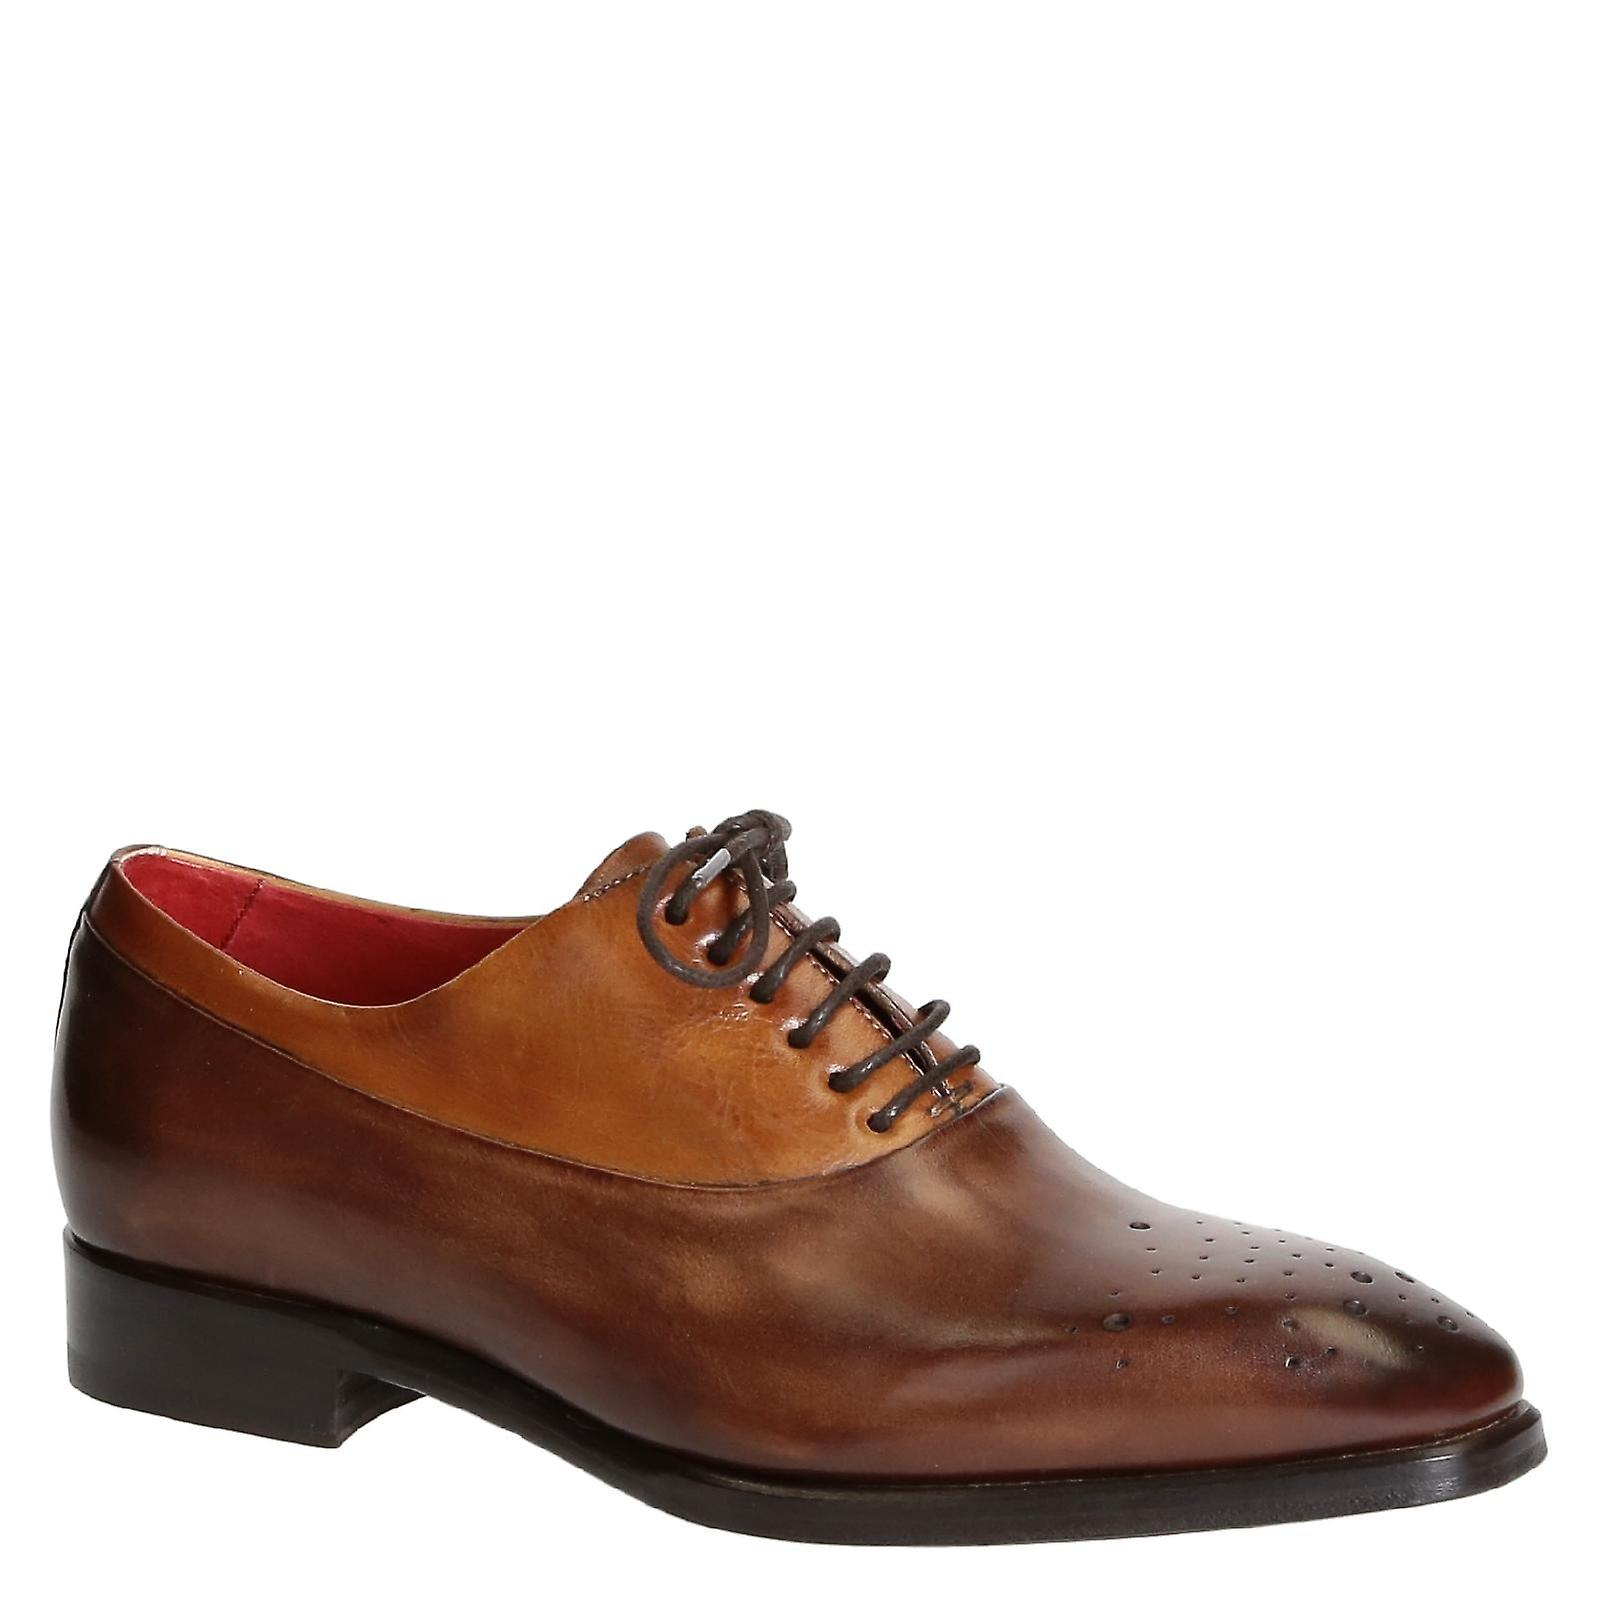 Handmade tan half brogue chaussures in genuine leather